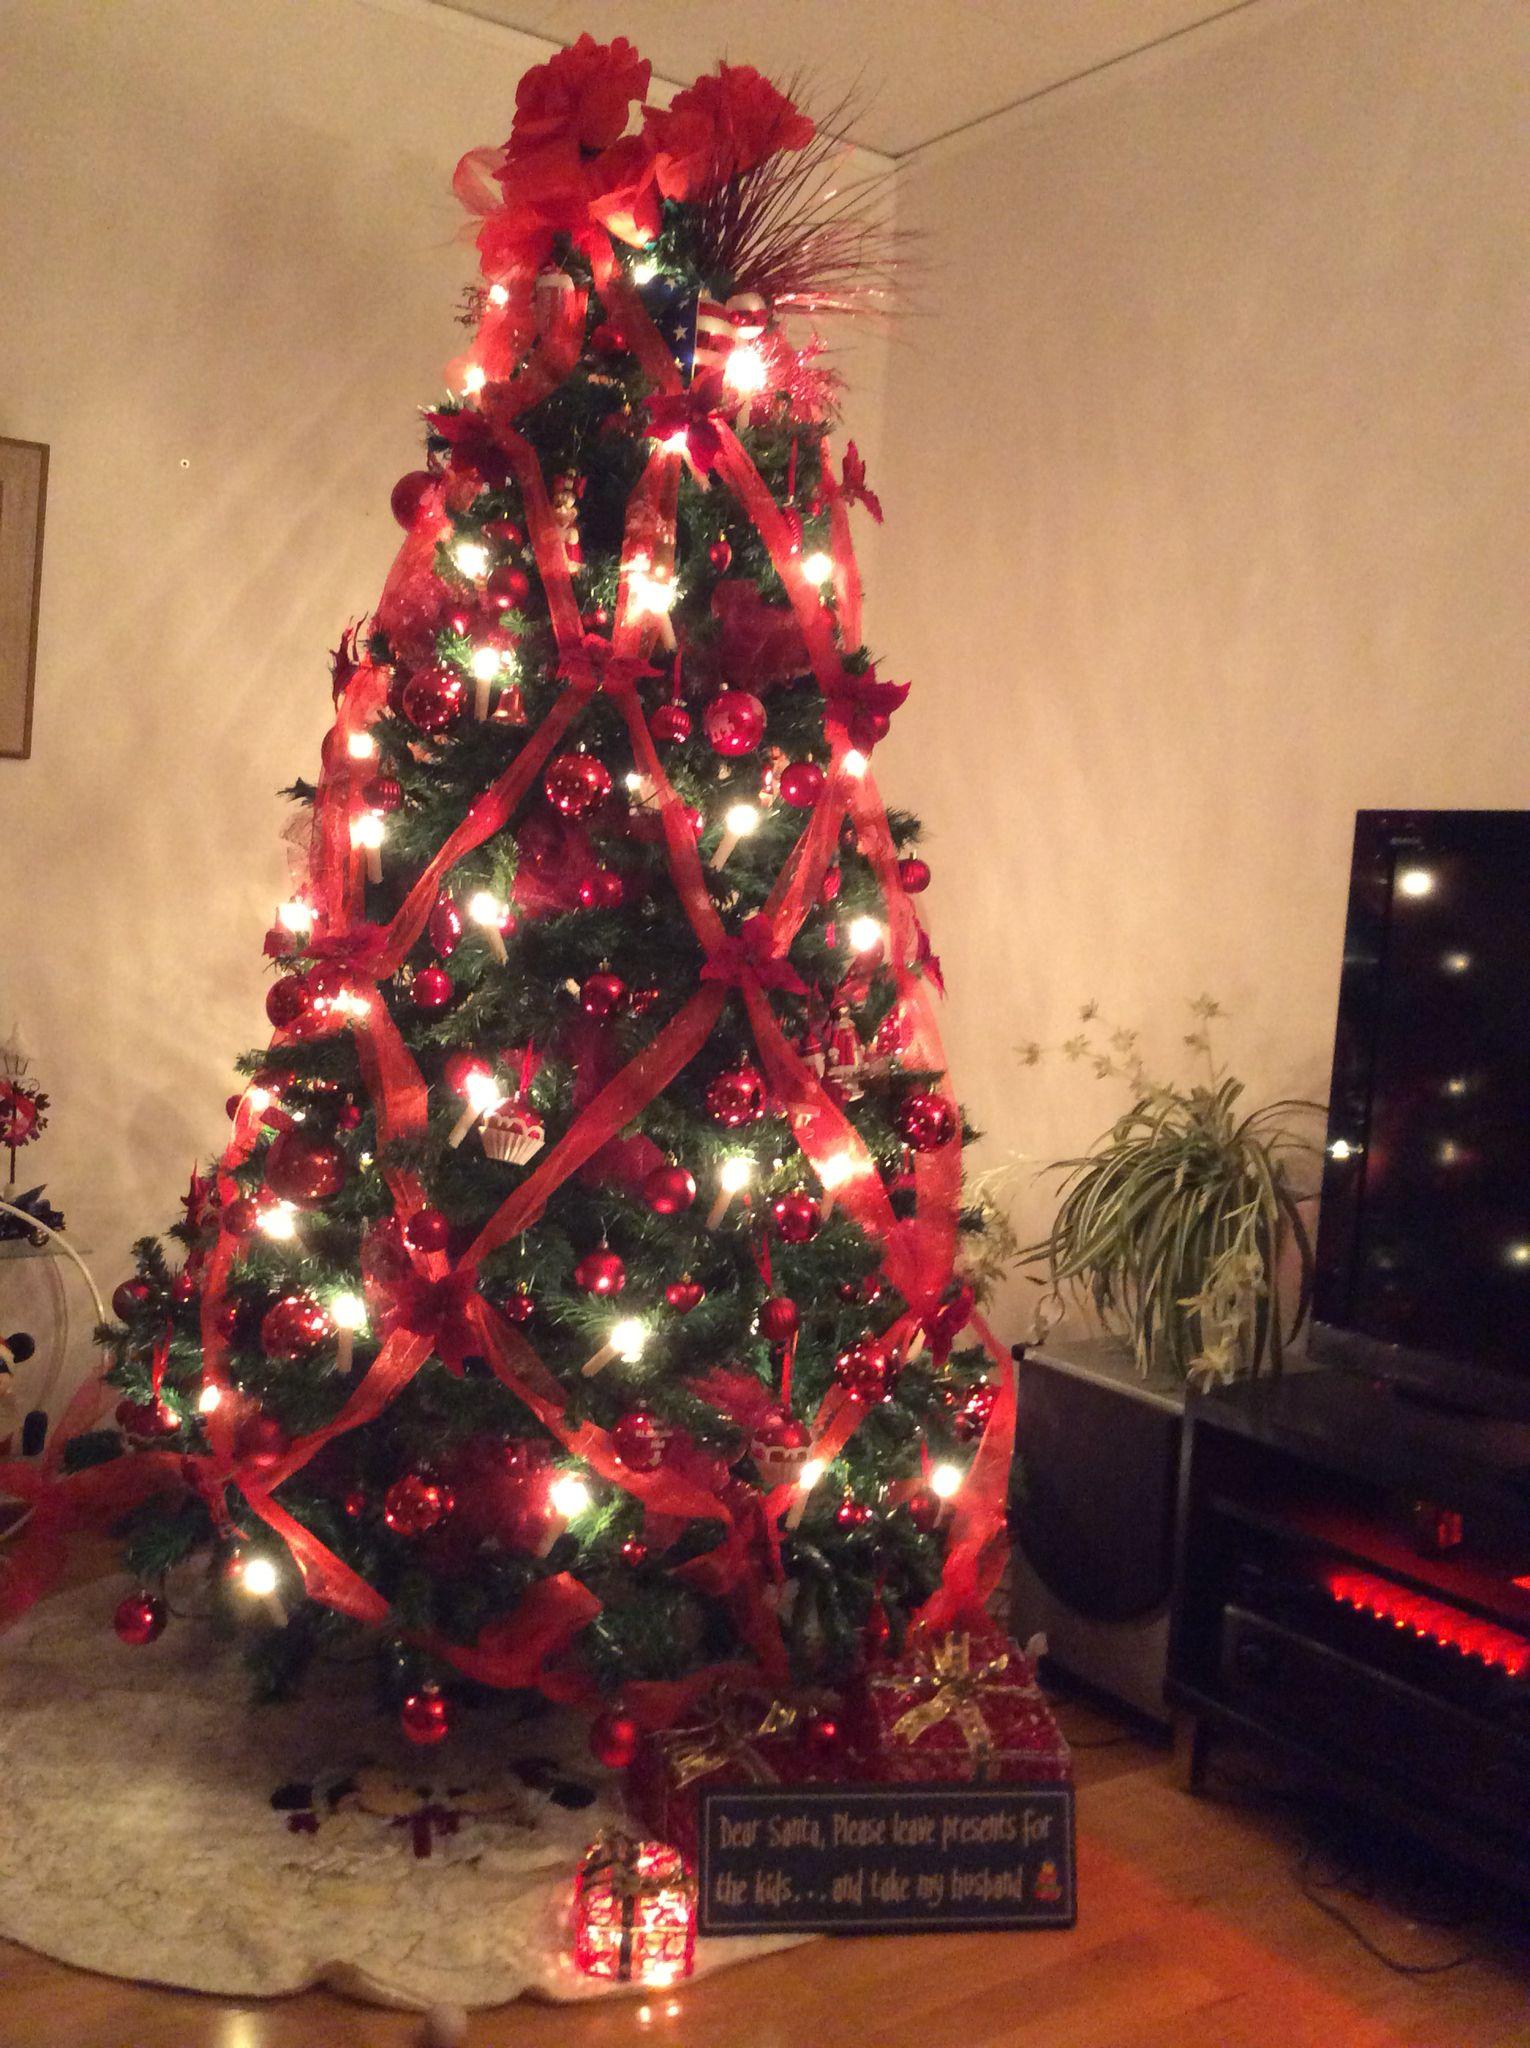 My big x-mas tree